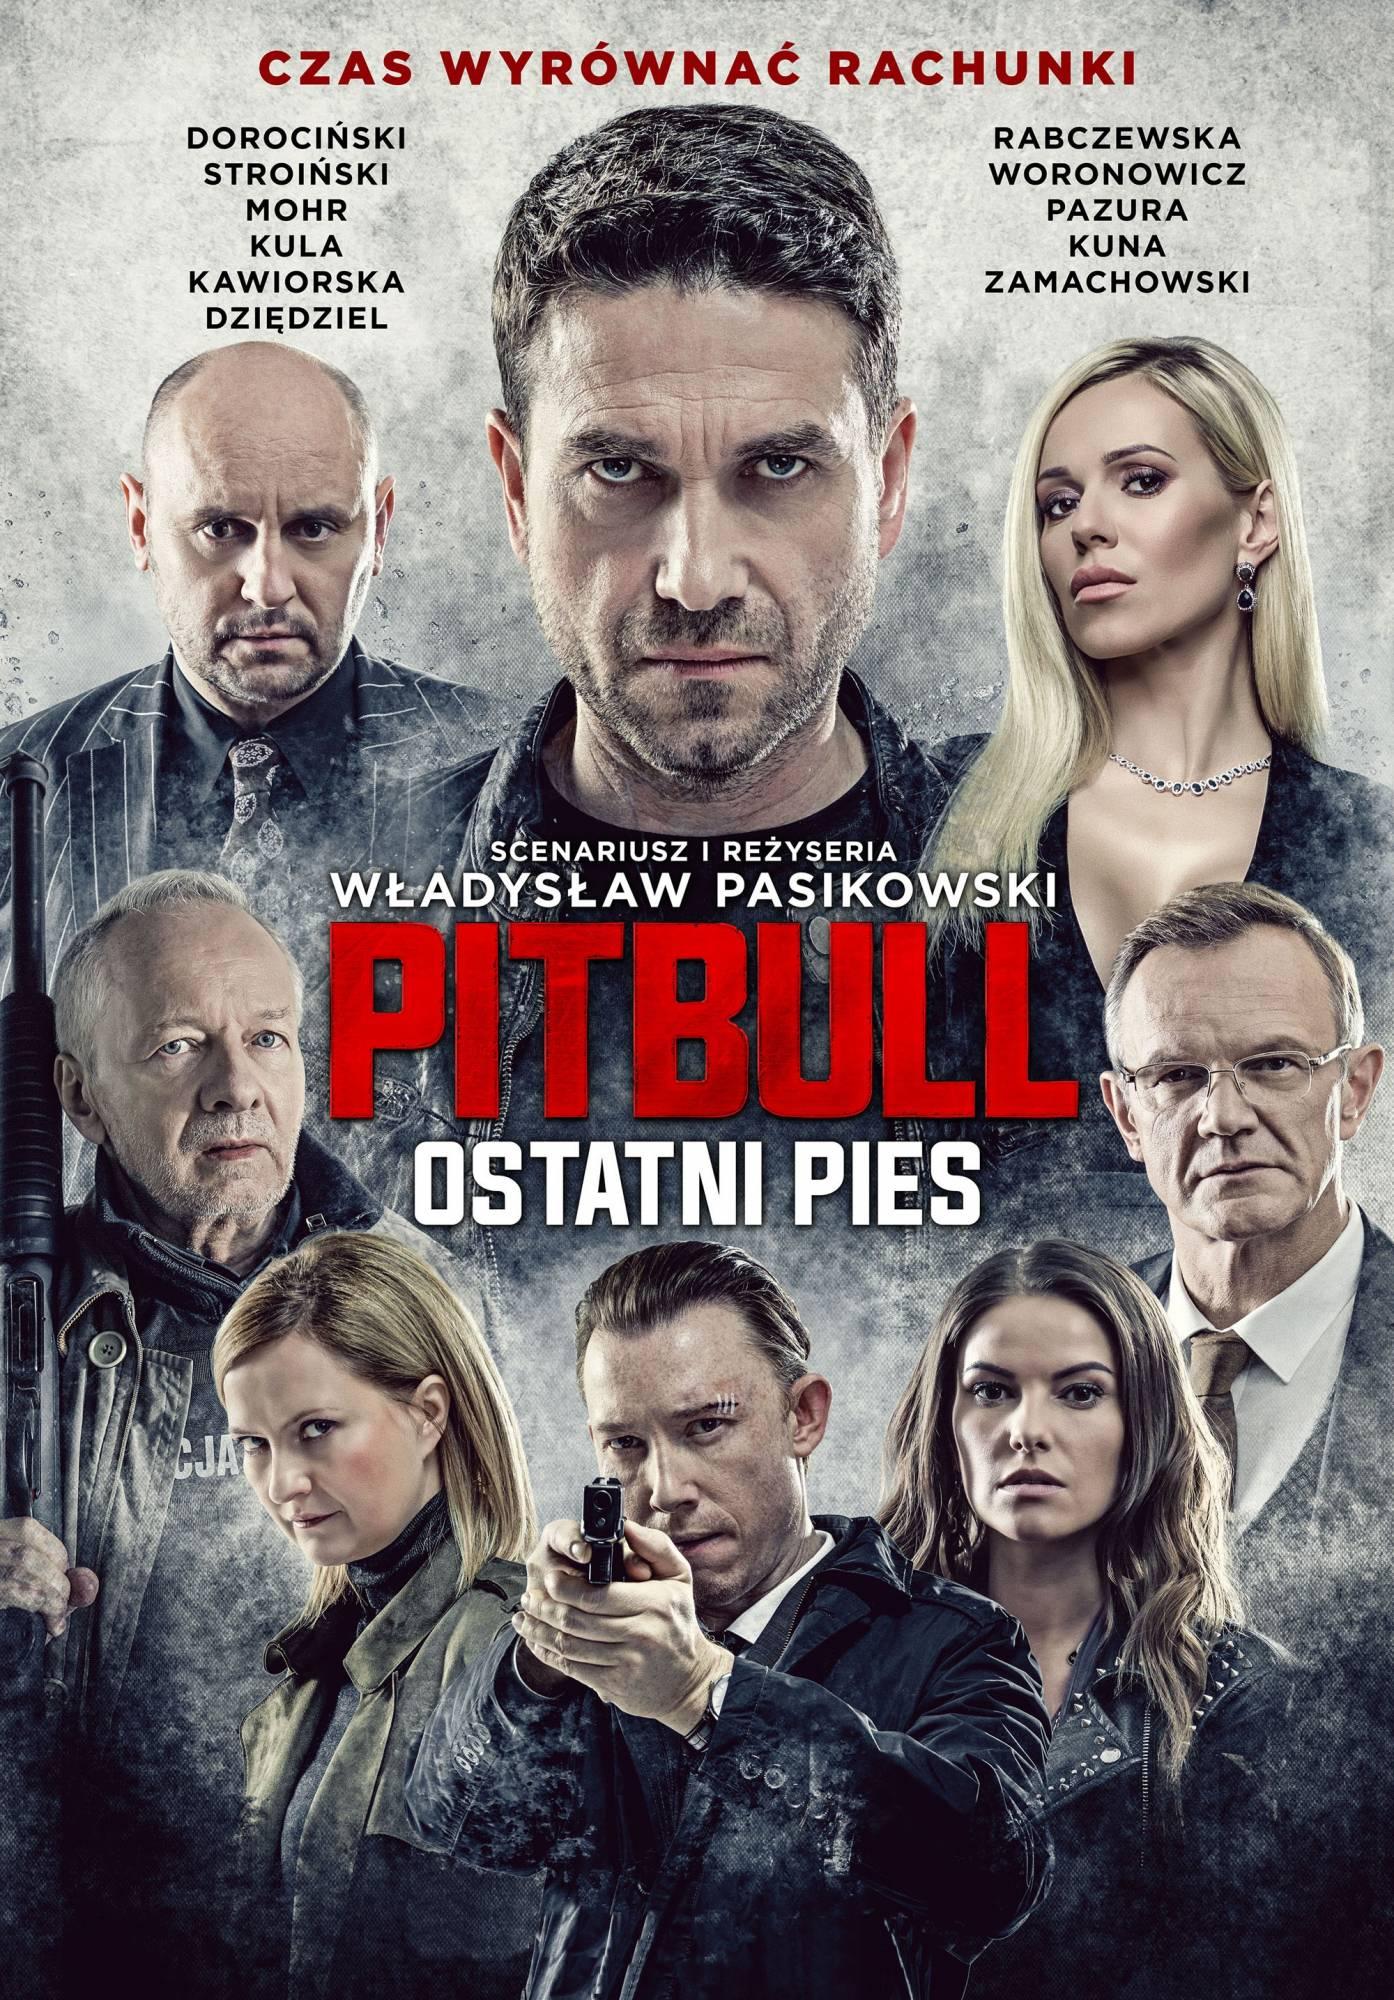 pitbull-ostatni-pies-plakat-01.jpg